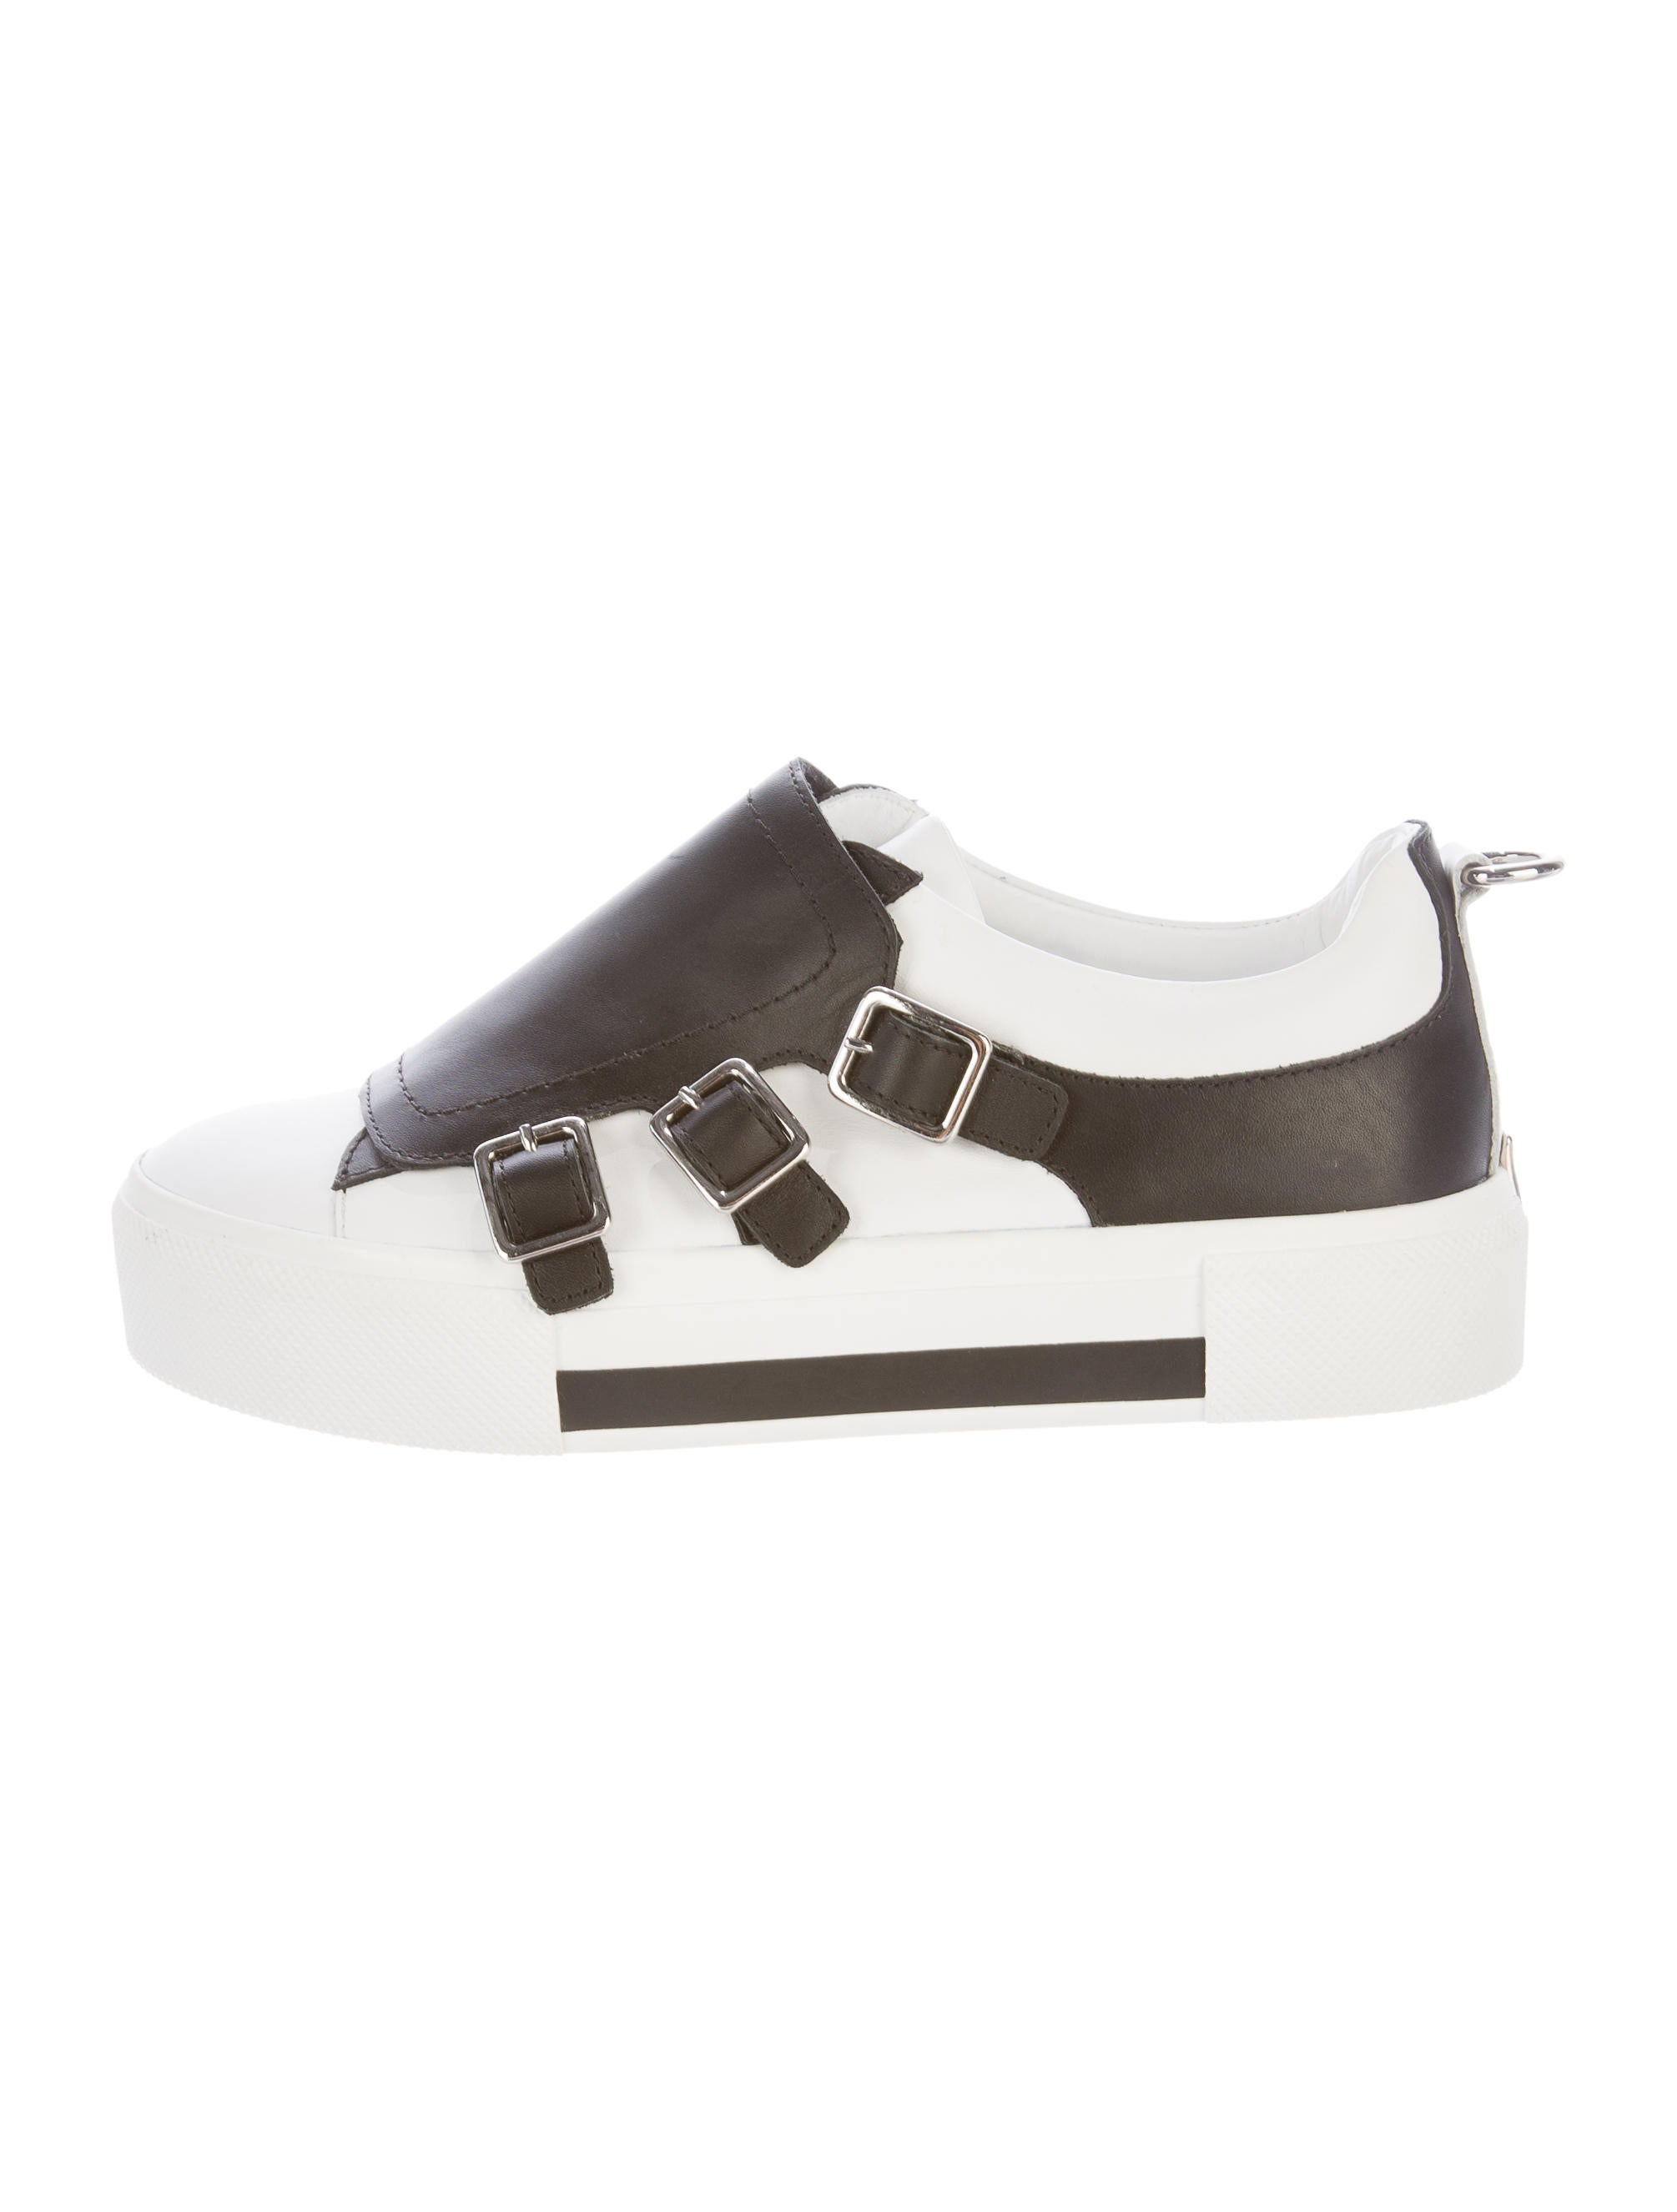 dfbdd6be10da Alexander McQueen Low-Top Platform Sneakers - Shoes - ALE39138